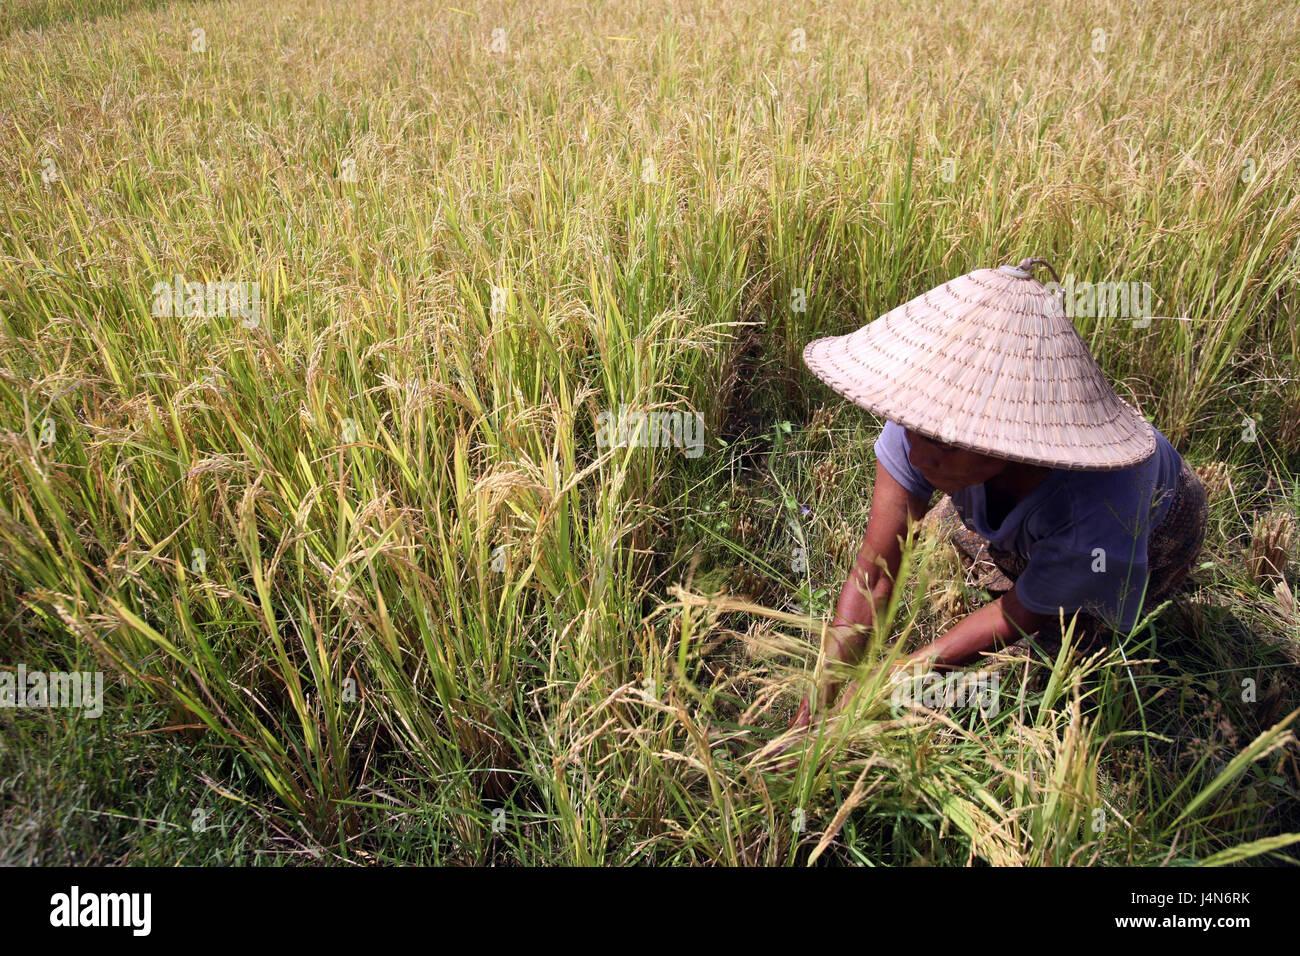 Democratic republic of Timor-Leste, Venilale, woman, work, travel field, - Stock Image